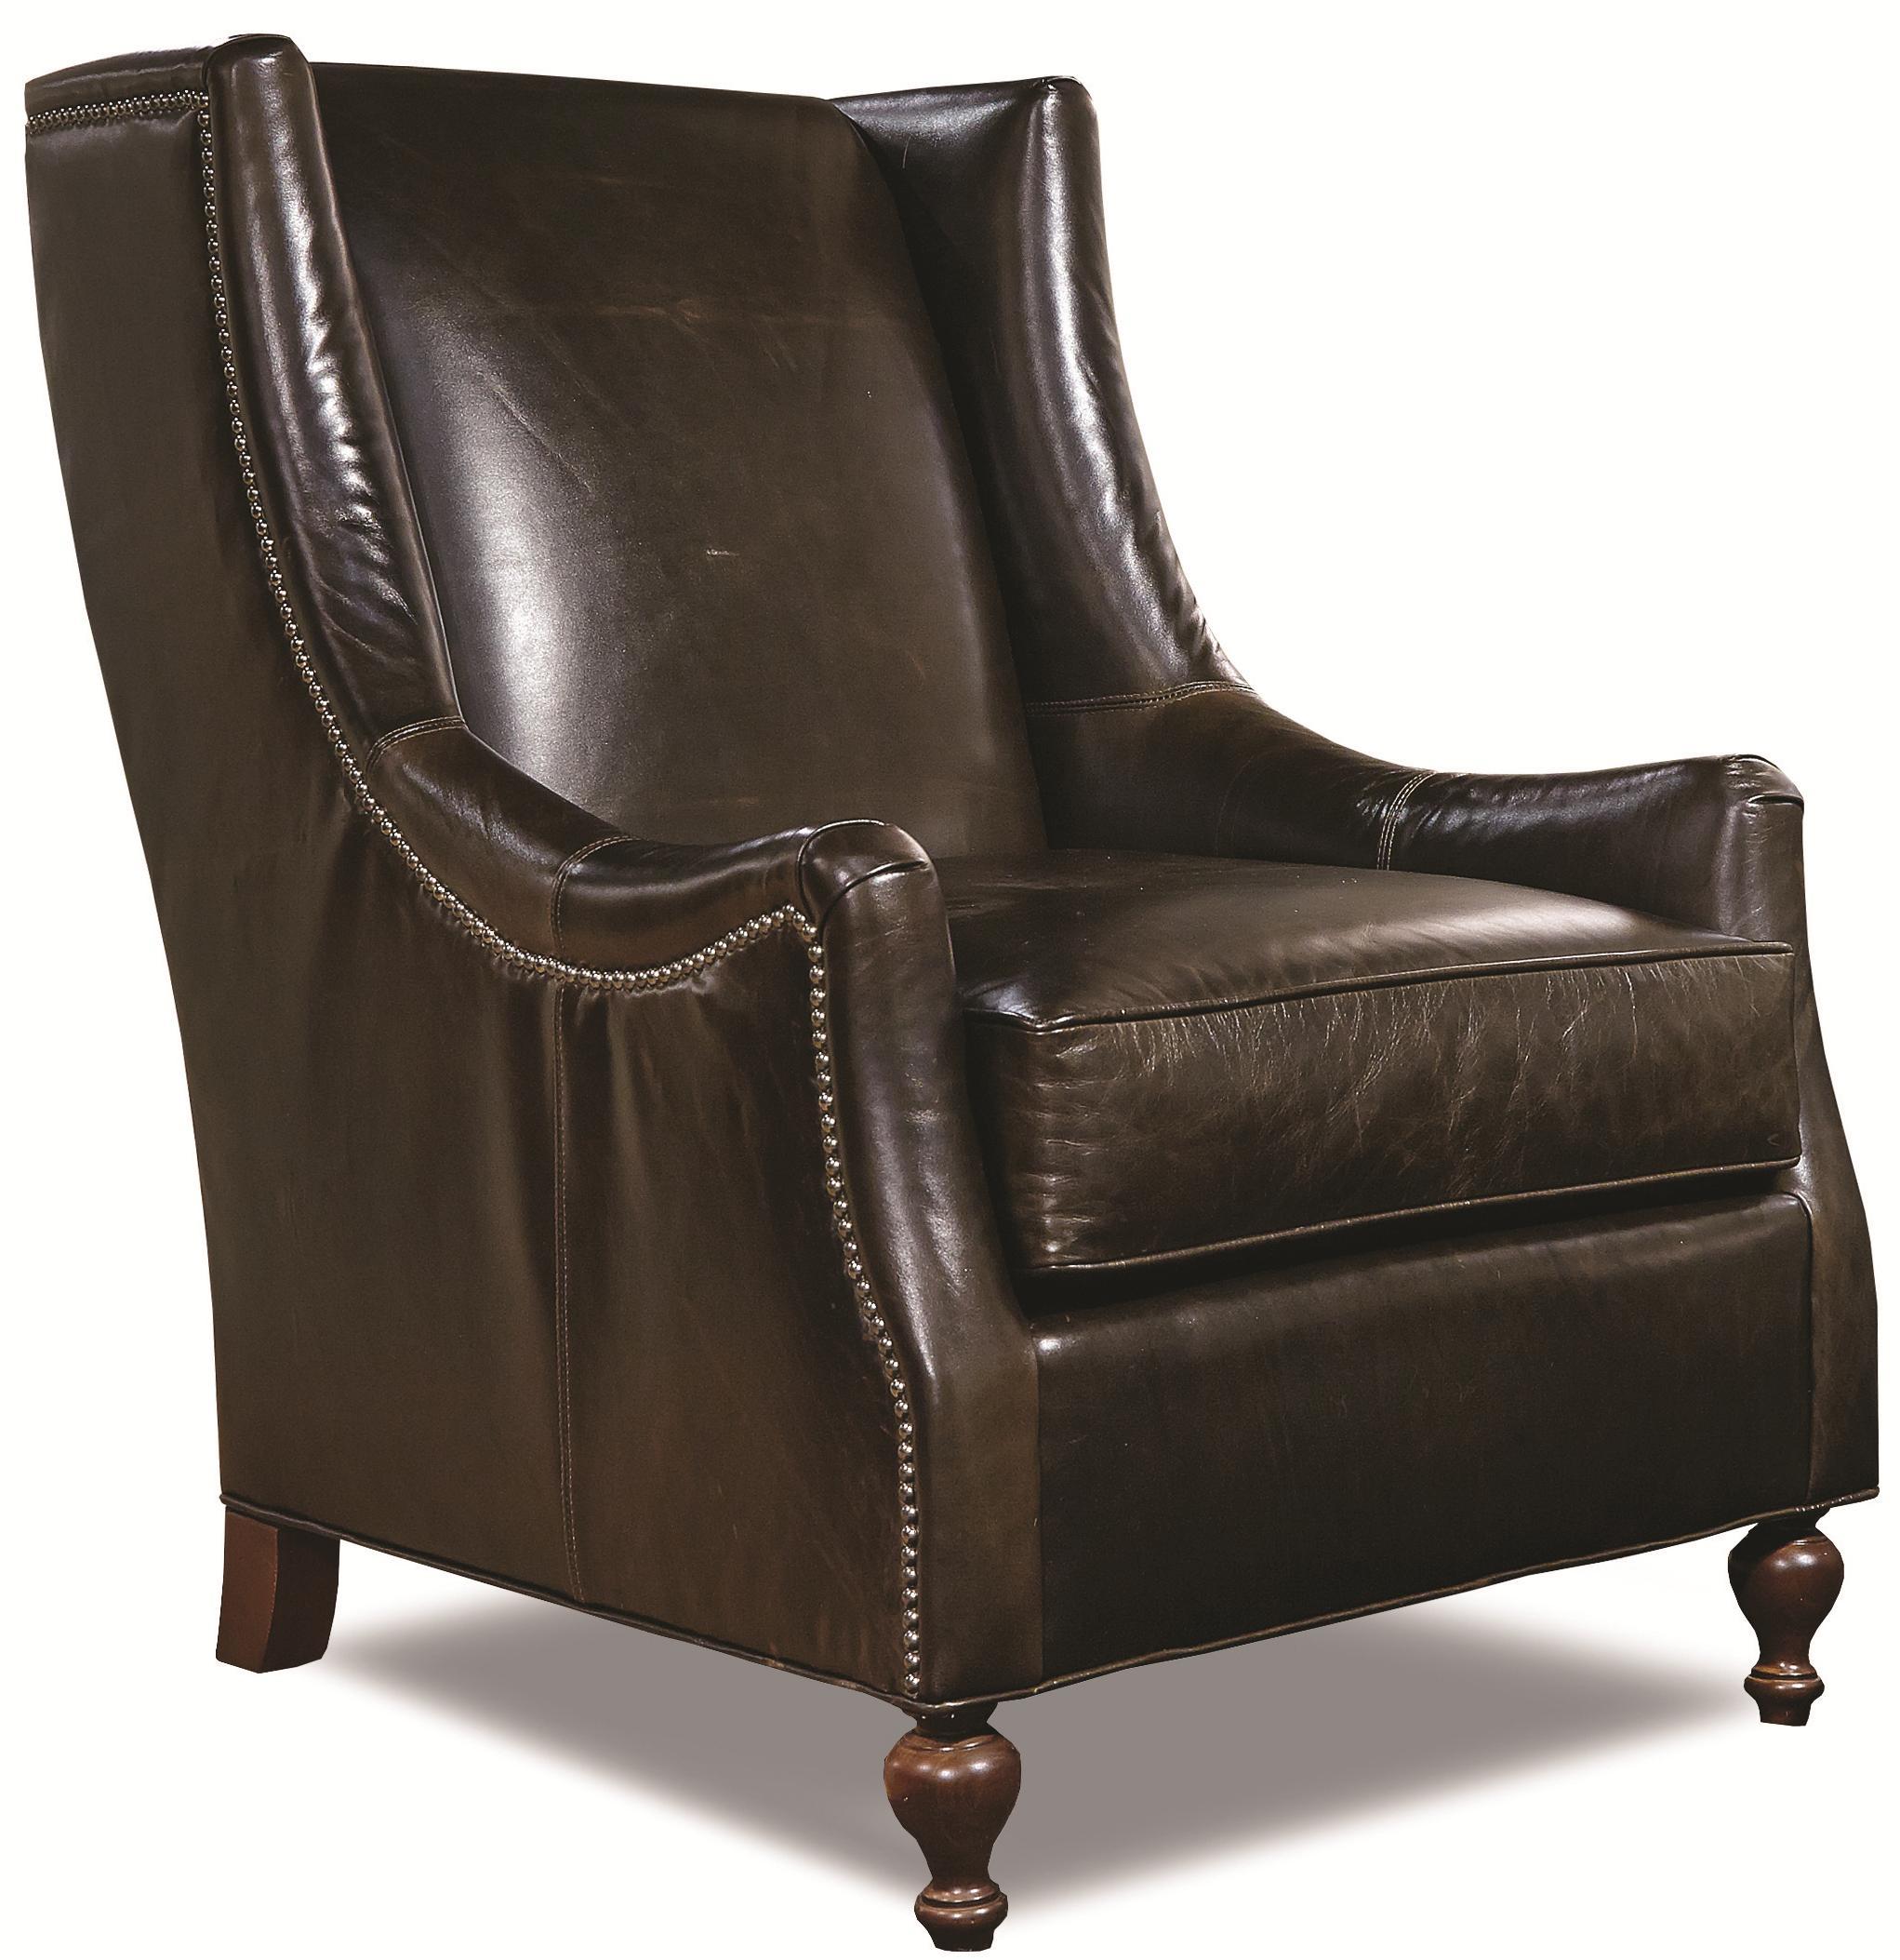 7497 Traditional Accent Chair by Geoffrey Alexander at Sprintz Furniture